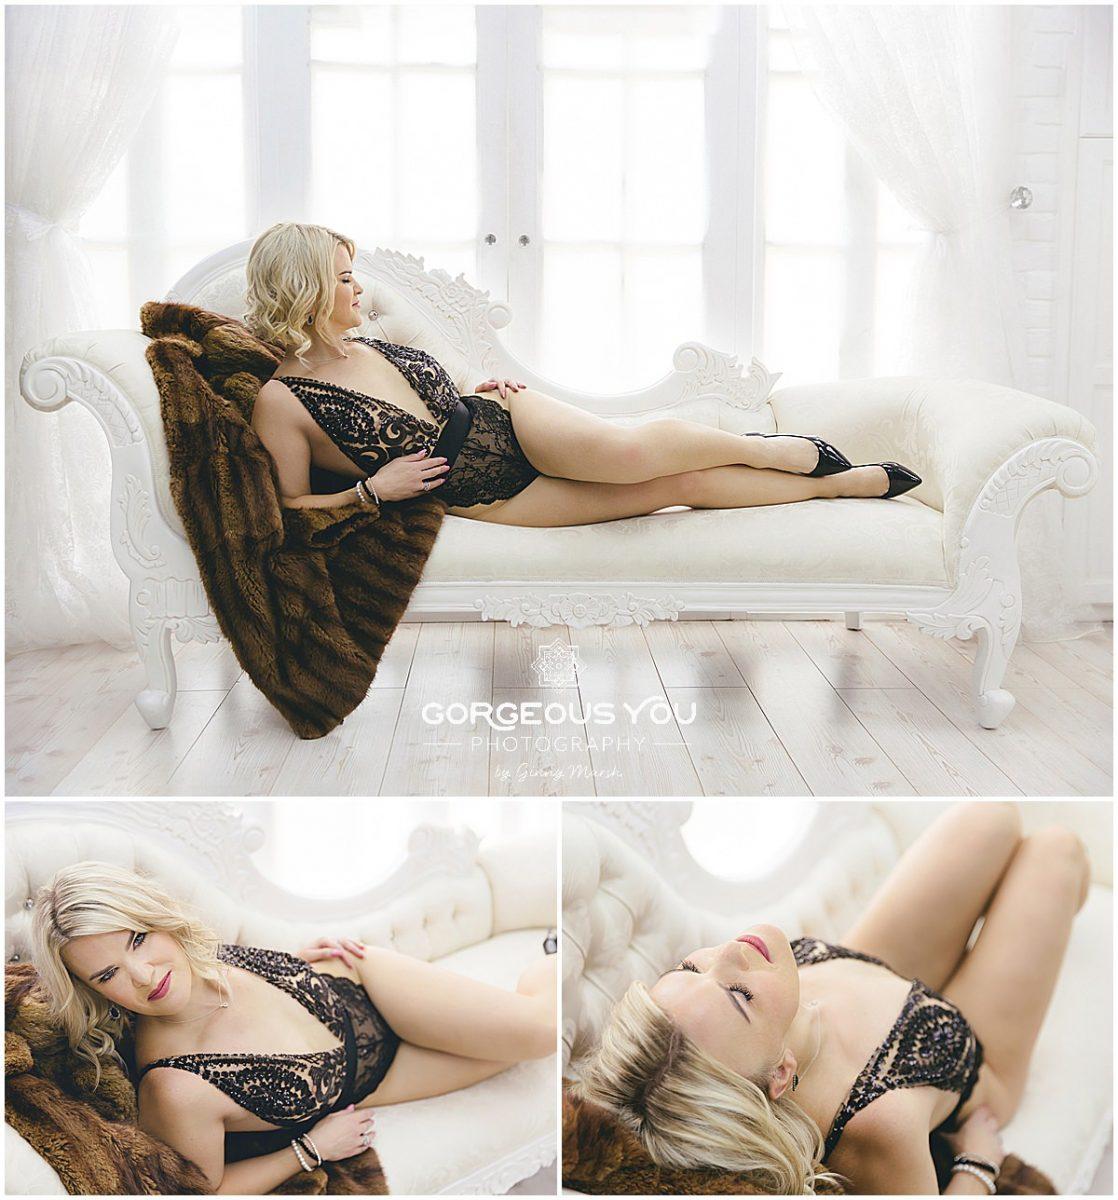 Sara's Fabulous at 40 Boudoir photoshoot